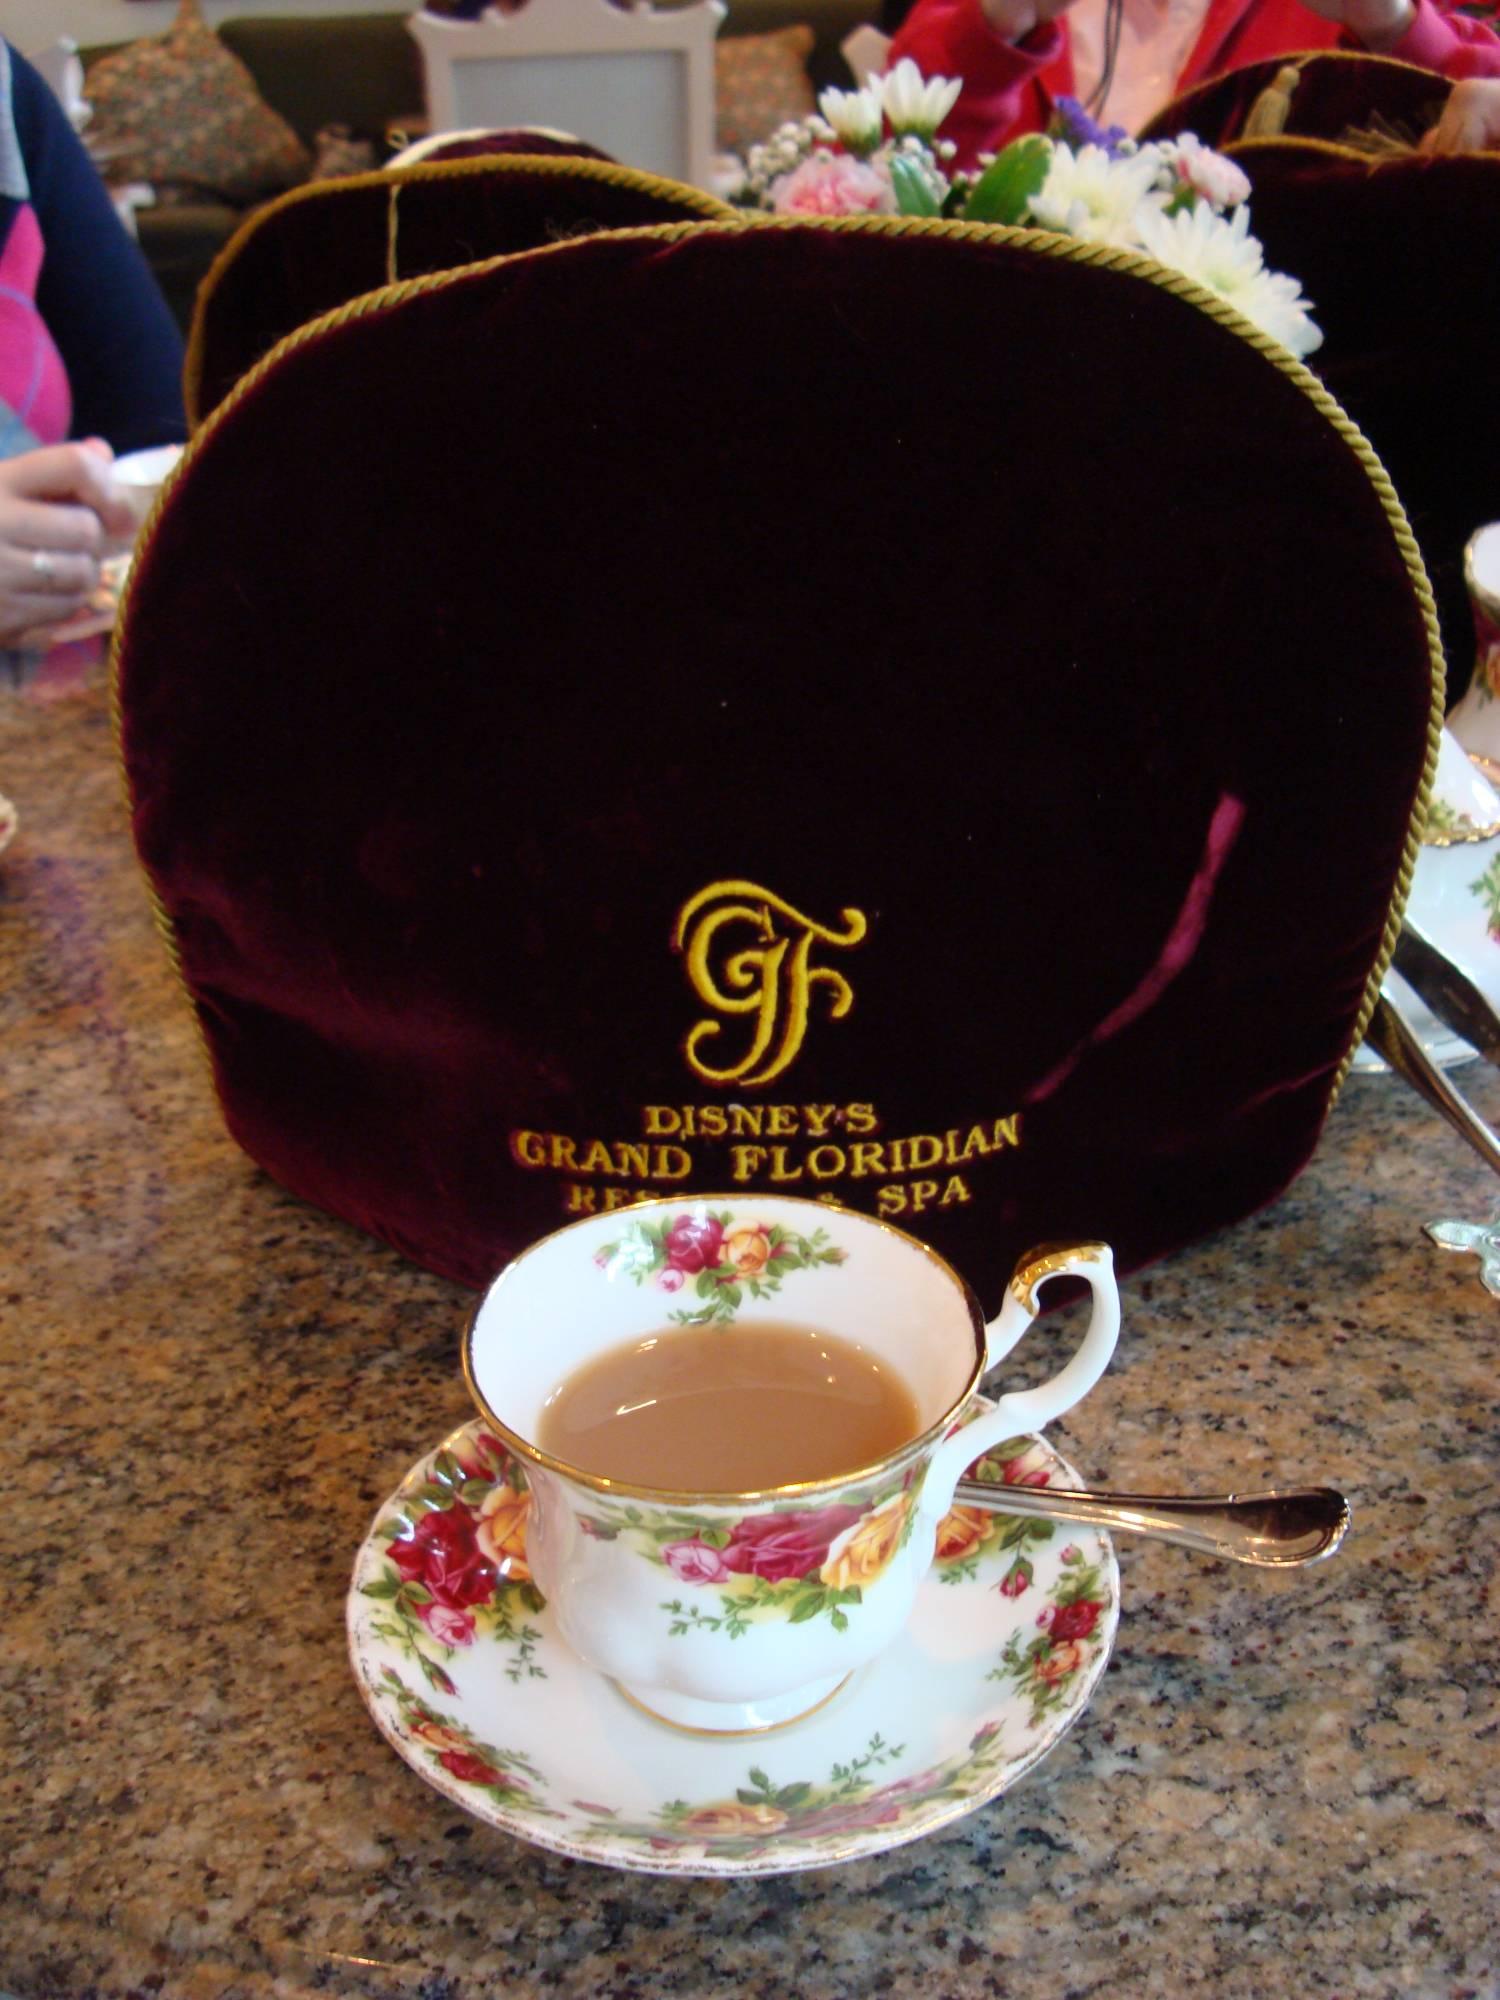 Grand Floridian - afternoon tea photo